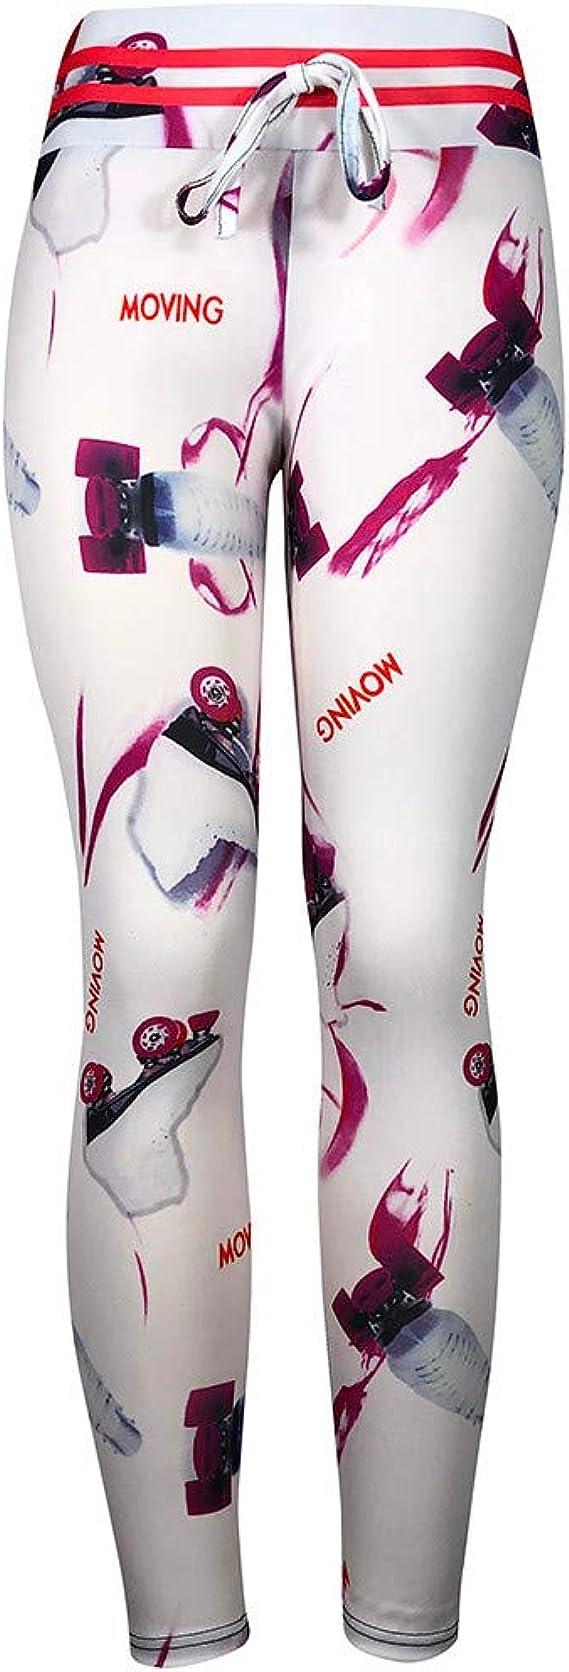 style Bas Jogging Grande GarconPantalon Large dress Femme 5q34RjAL